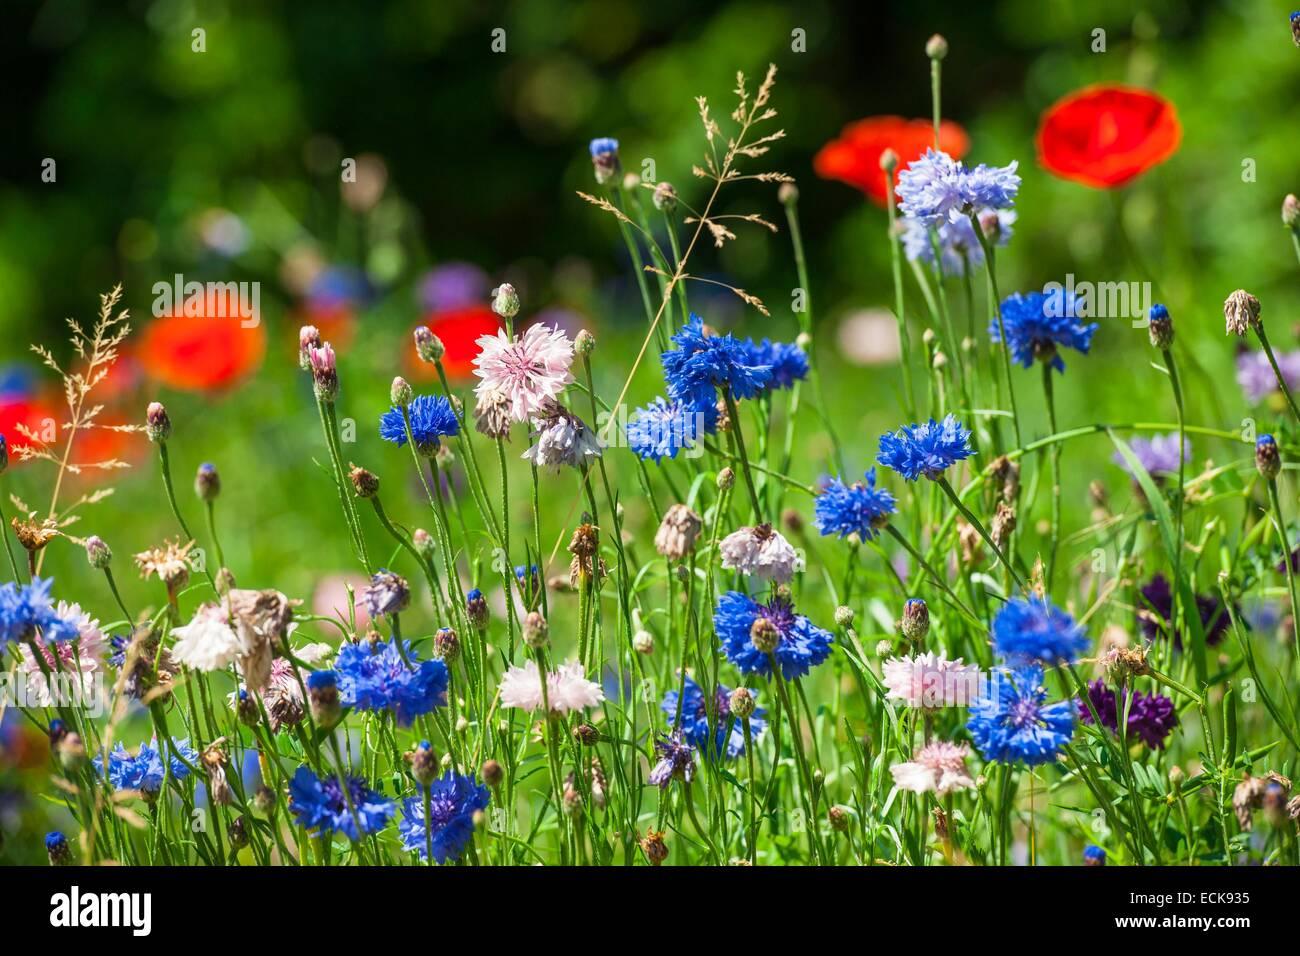 France, Isere, Grenoble, cornflowers (Centaurea cyanus) and poppies (Papaver rhoeas) Stock Photo